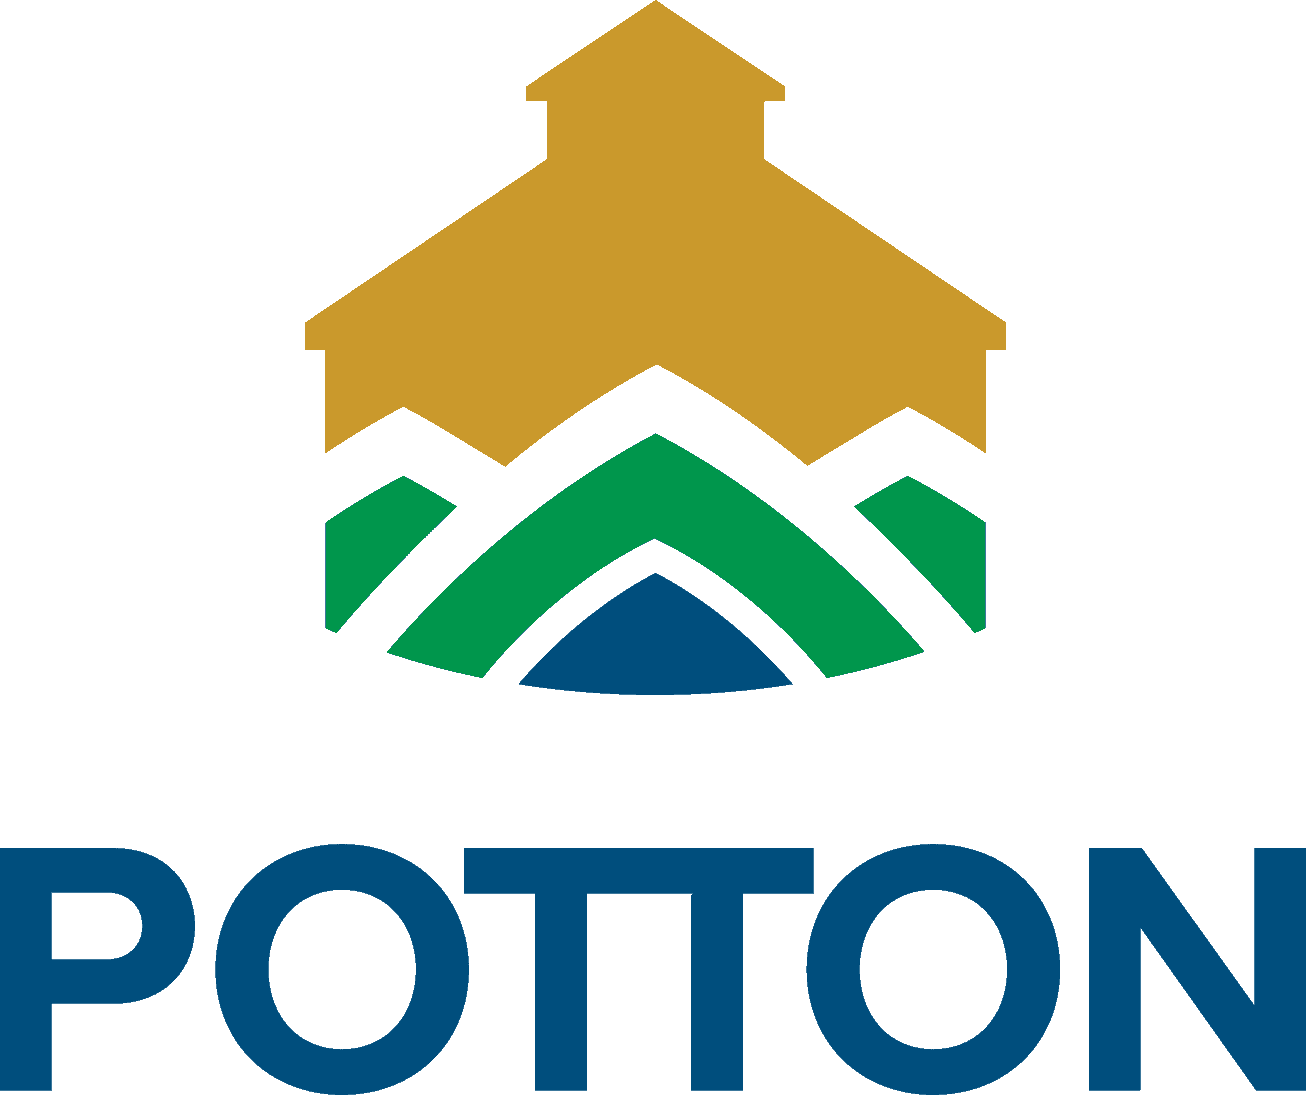 Ville Canton de Potton - Partenaire de SPA Estrie